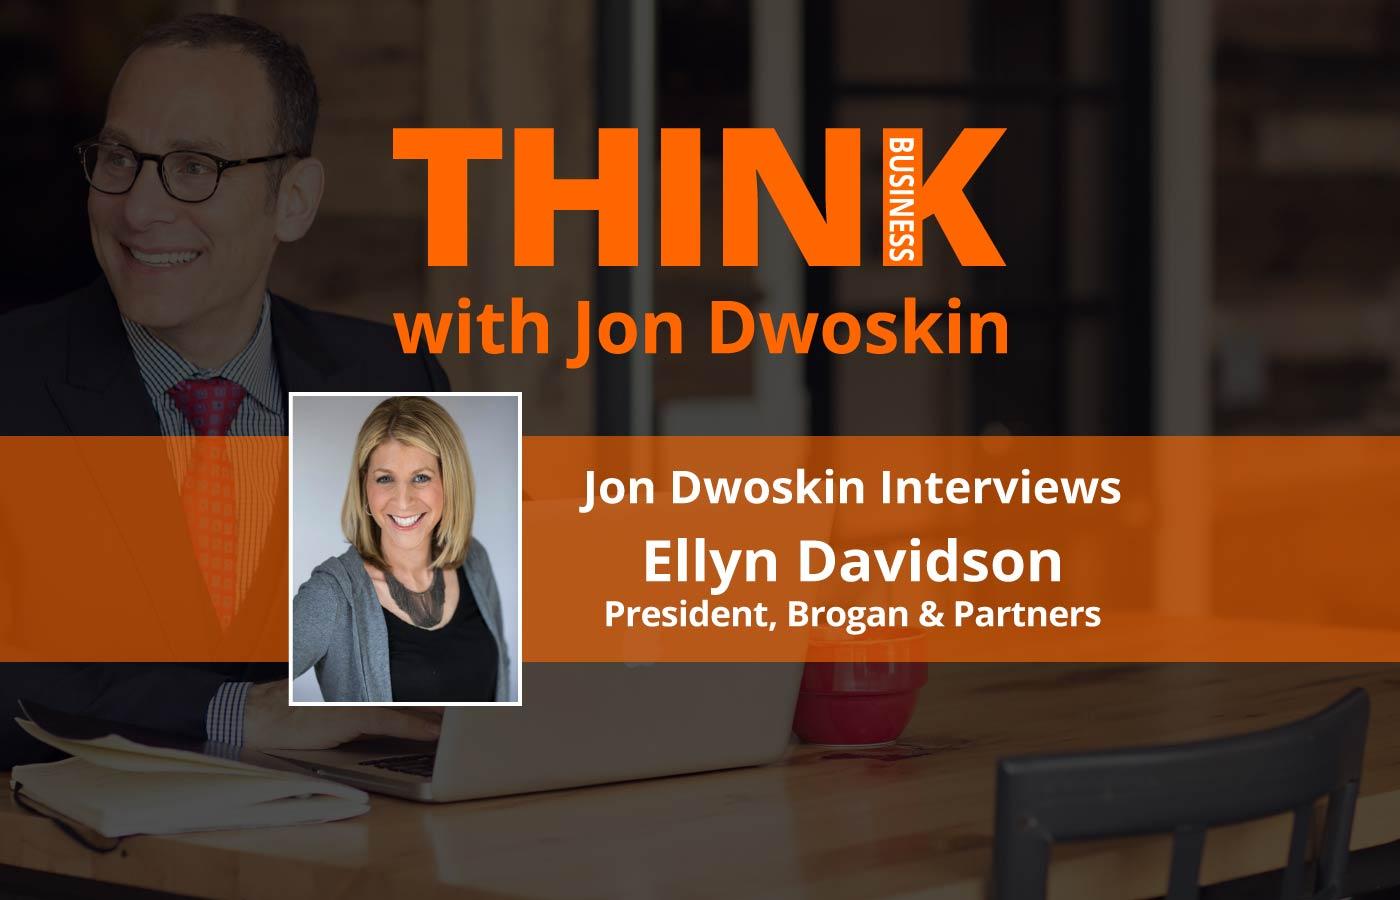 THINK Business Podcast: Jon Dwoskin Interviews Ellyn Davidson, President, Brogan & Partners